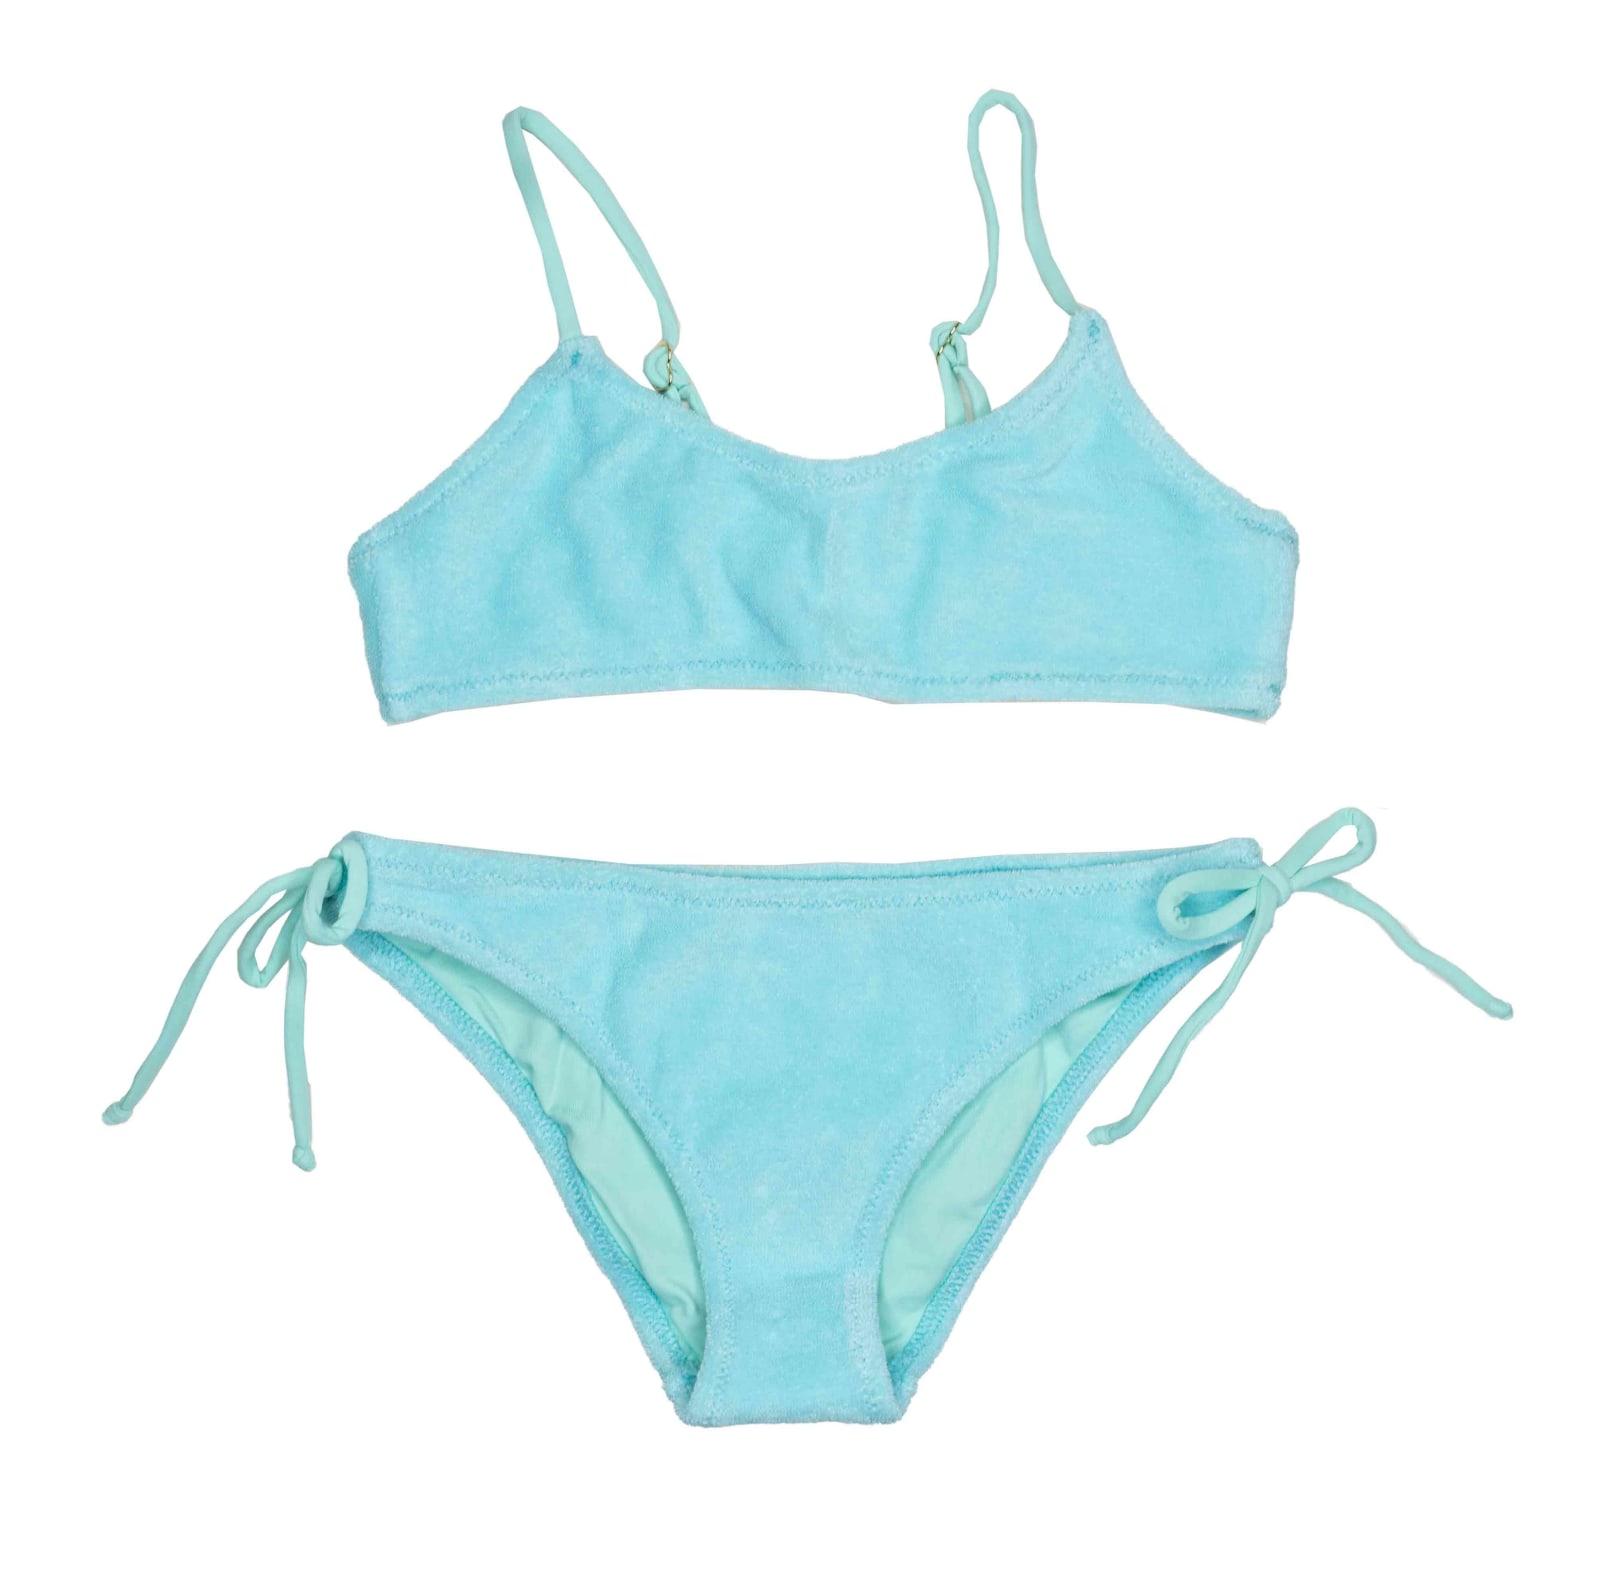 MC2 Saint Barth Sponge Aqua Marine Girls Bralette Bikini